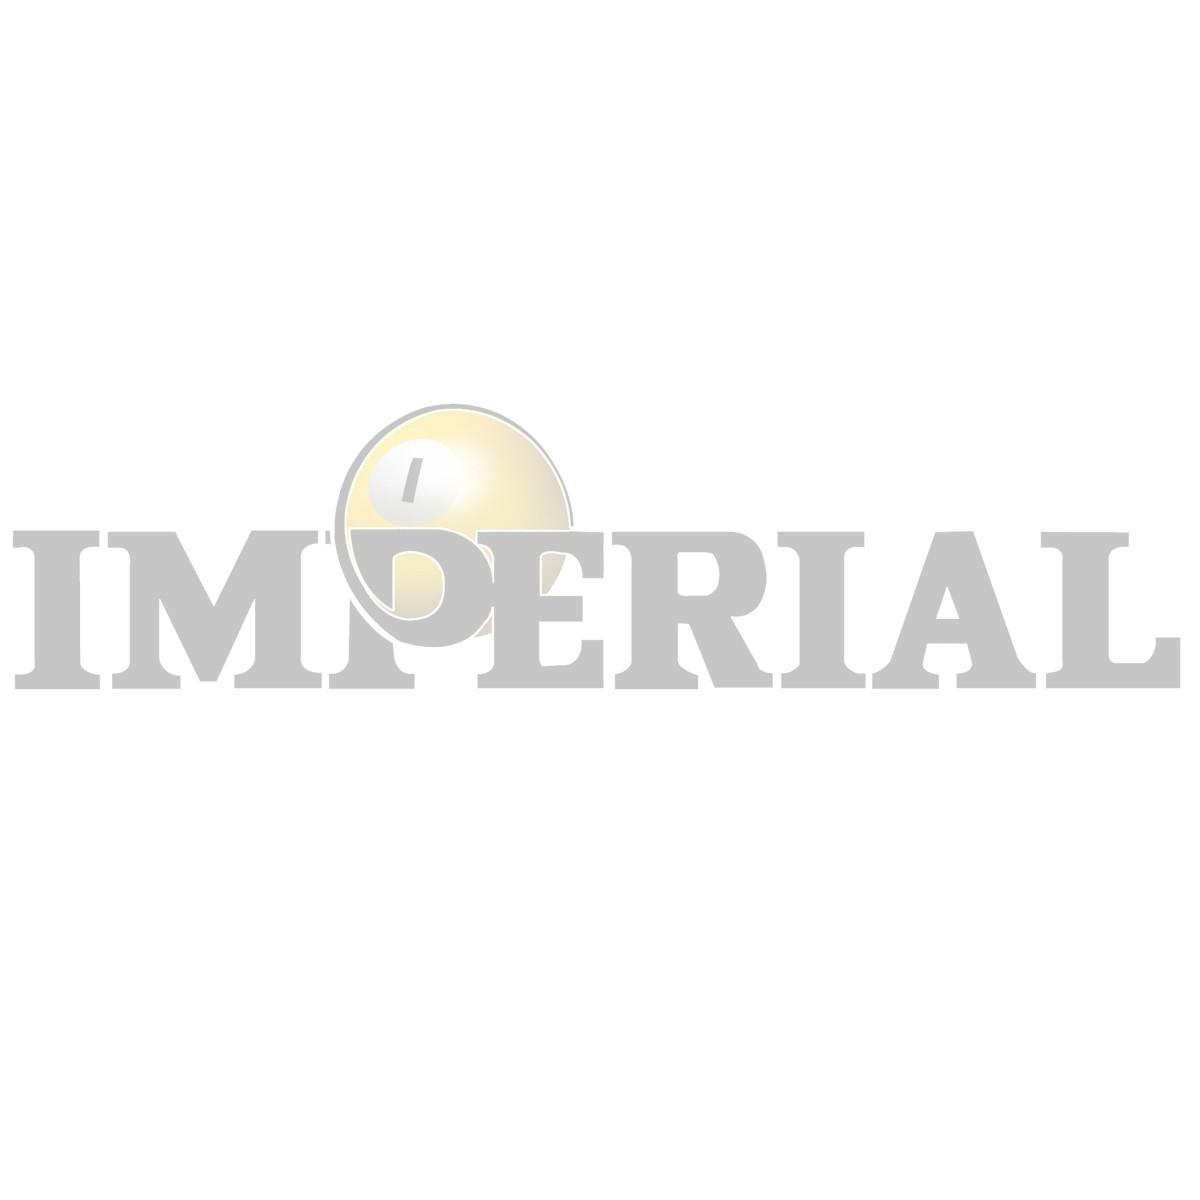 Washington Nationals Home vs. Away Billiard Ball Set